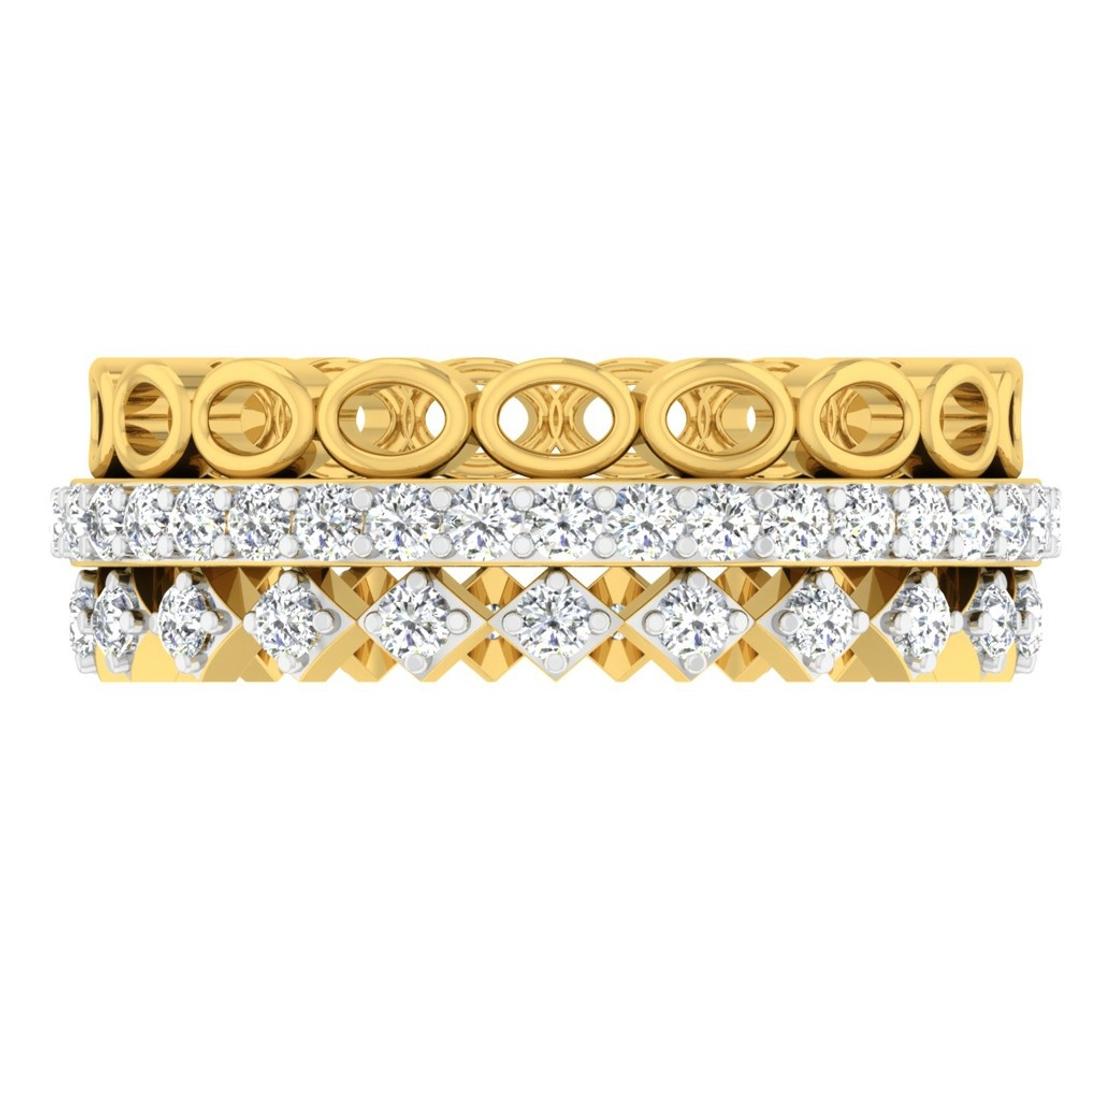 Sarvada Jewels' The Esmeralda Ring